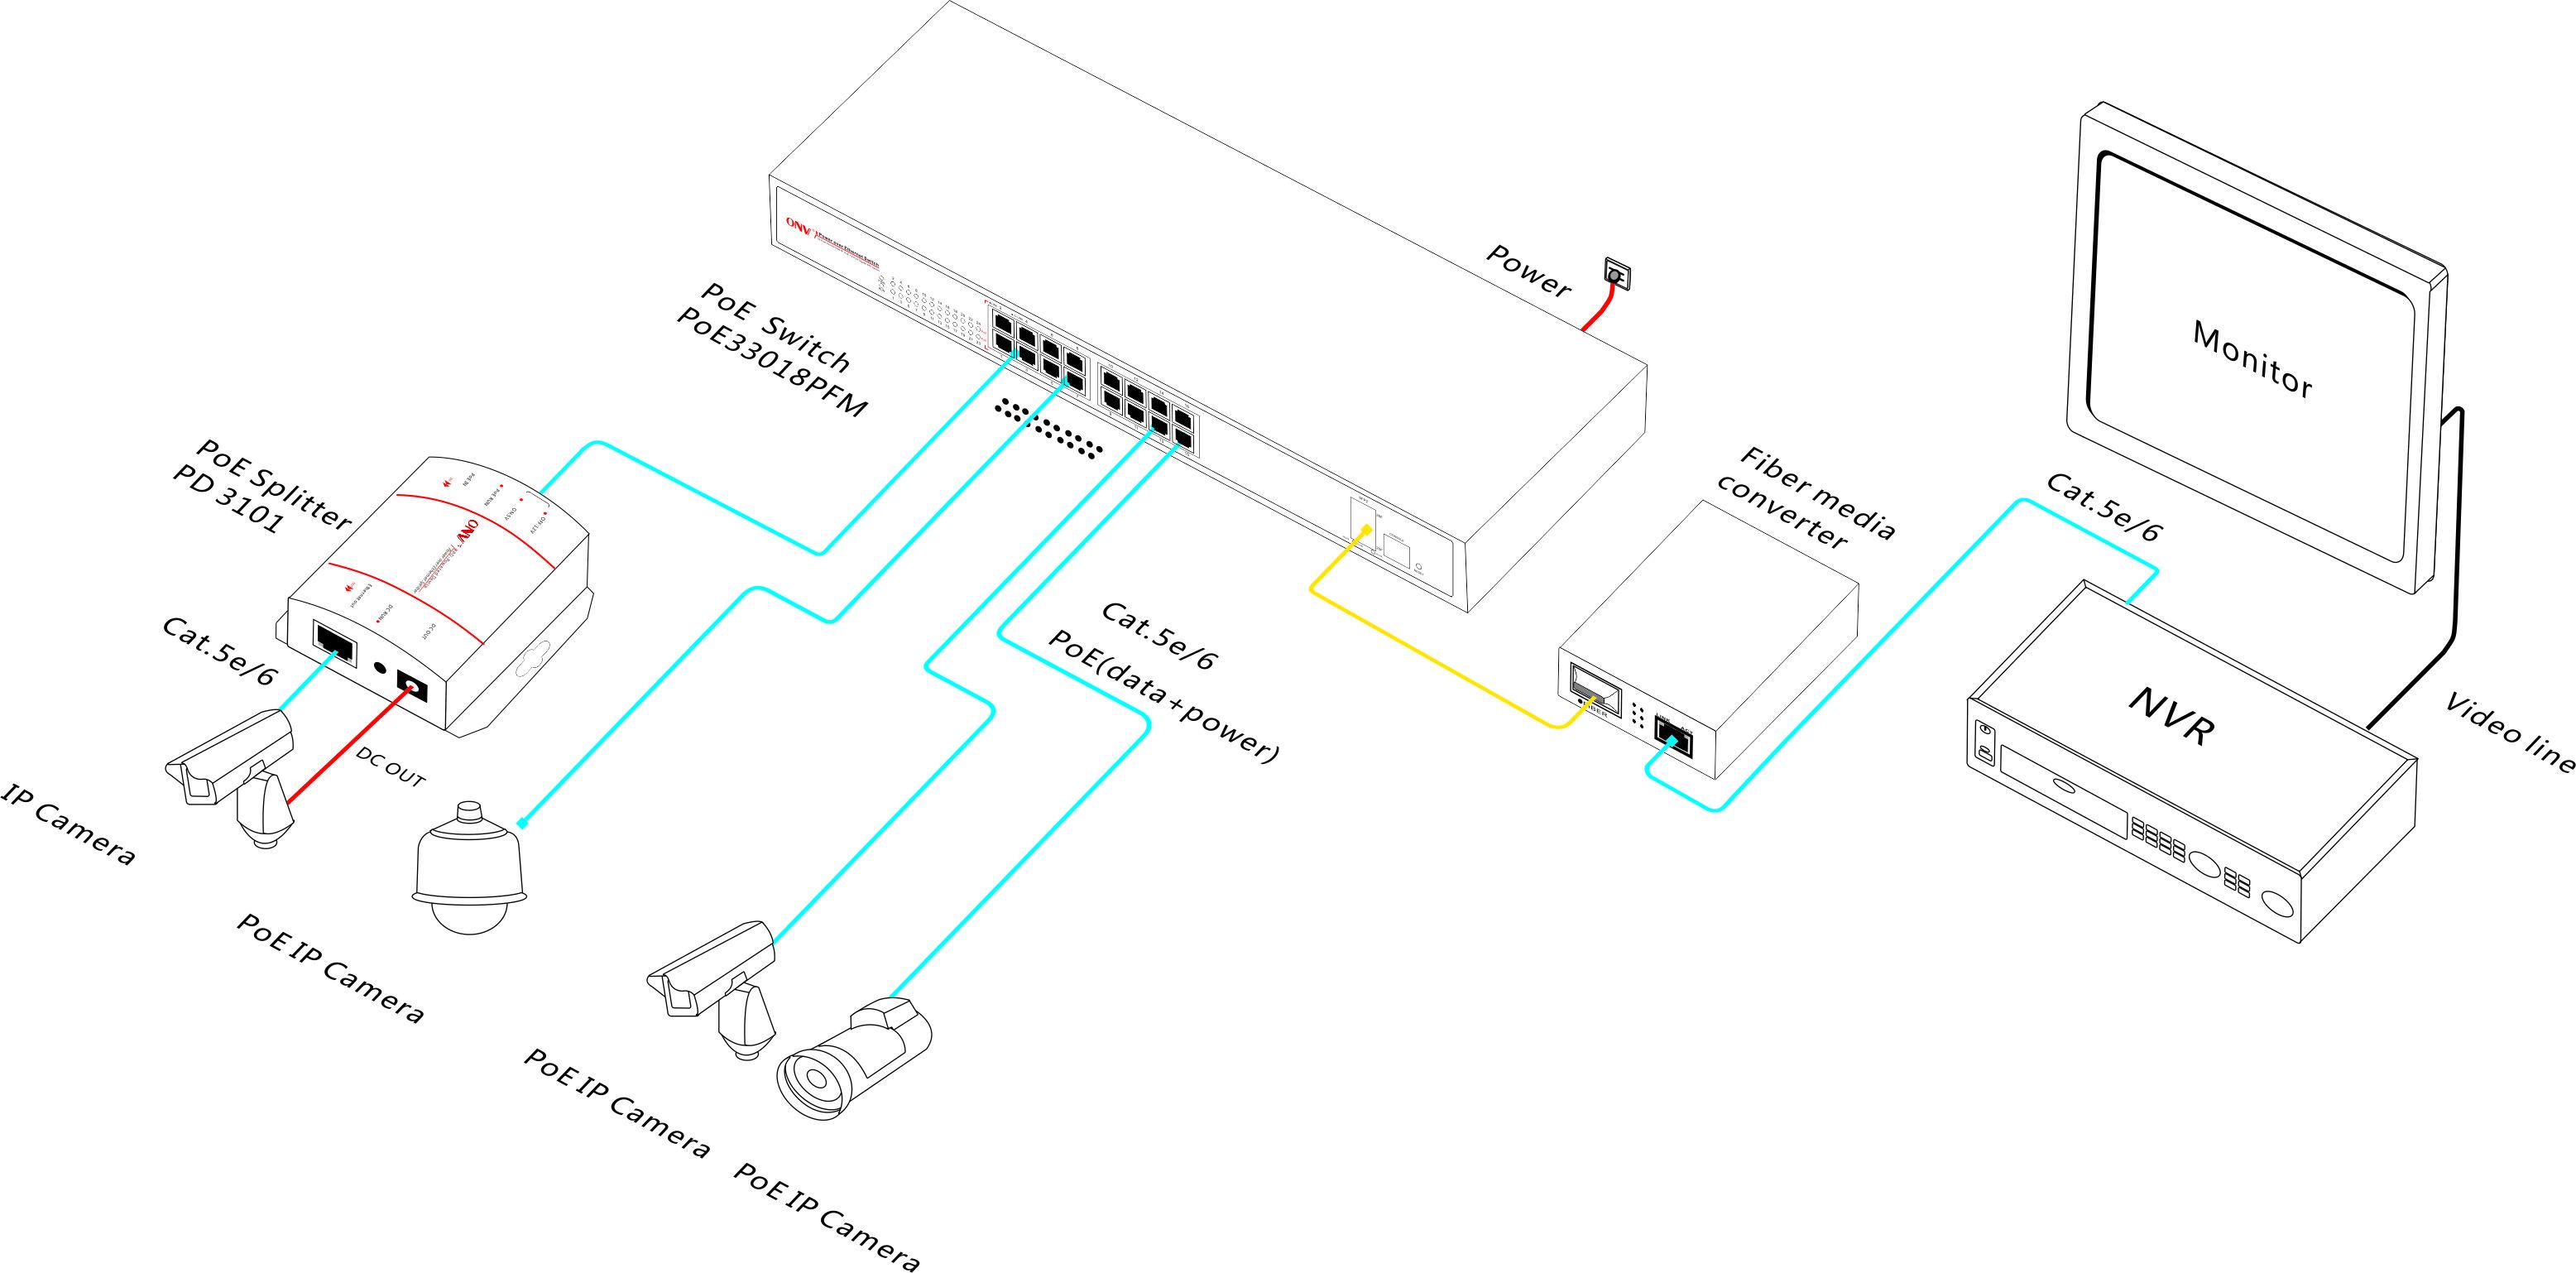 onv-poe33018pfm poe switch 16 port gigabit